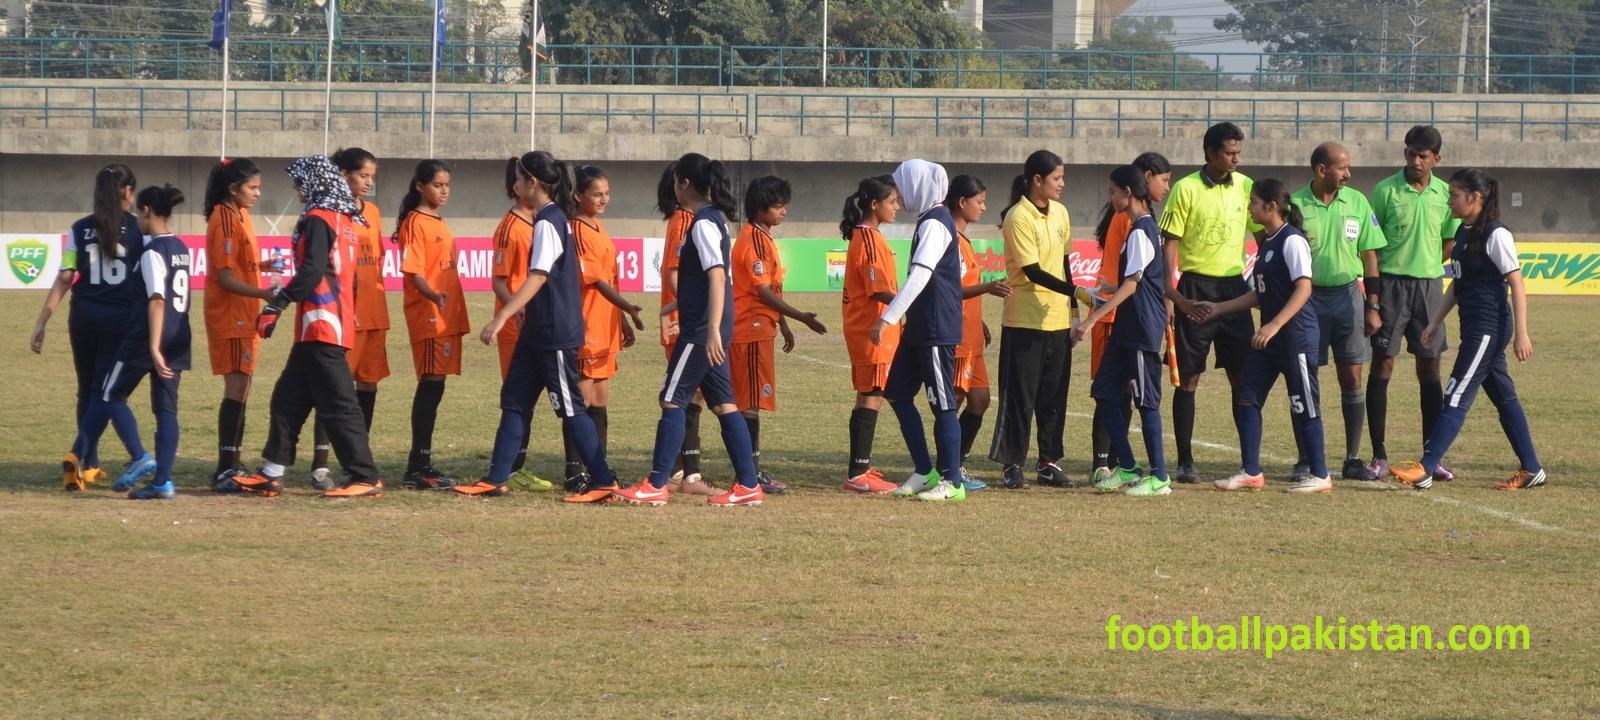 Footprints: Embracing Football [DAWN]